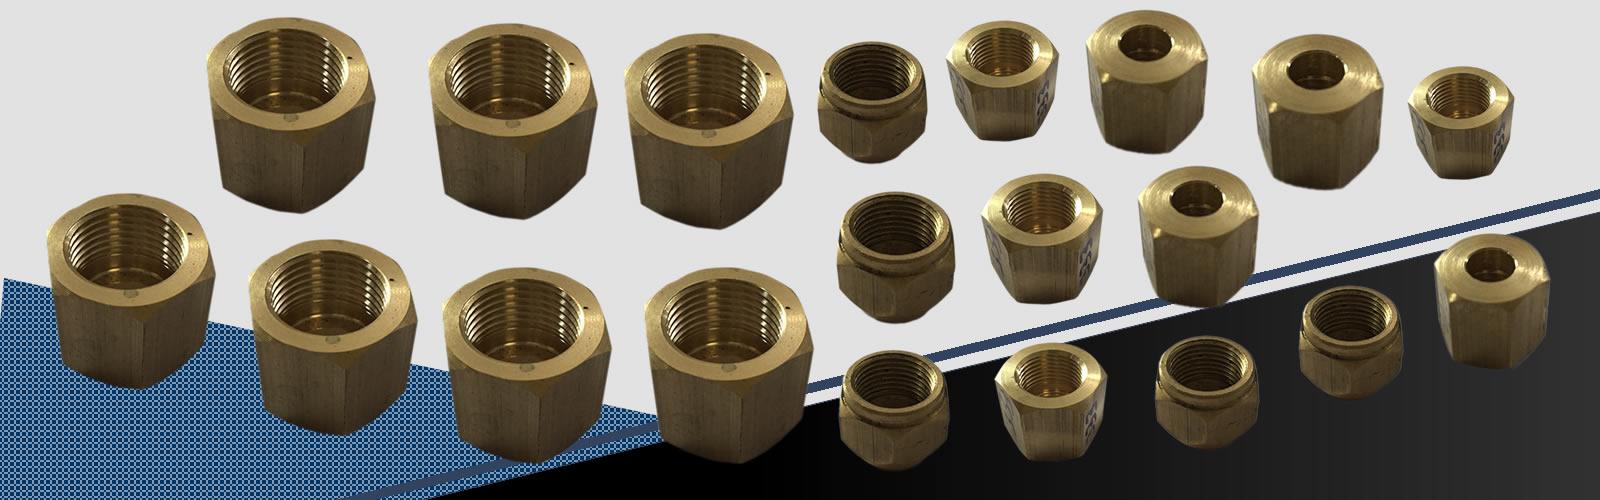 brass-oring-nuts